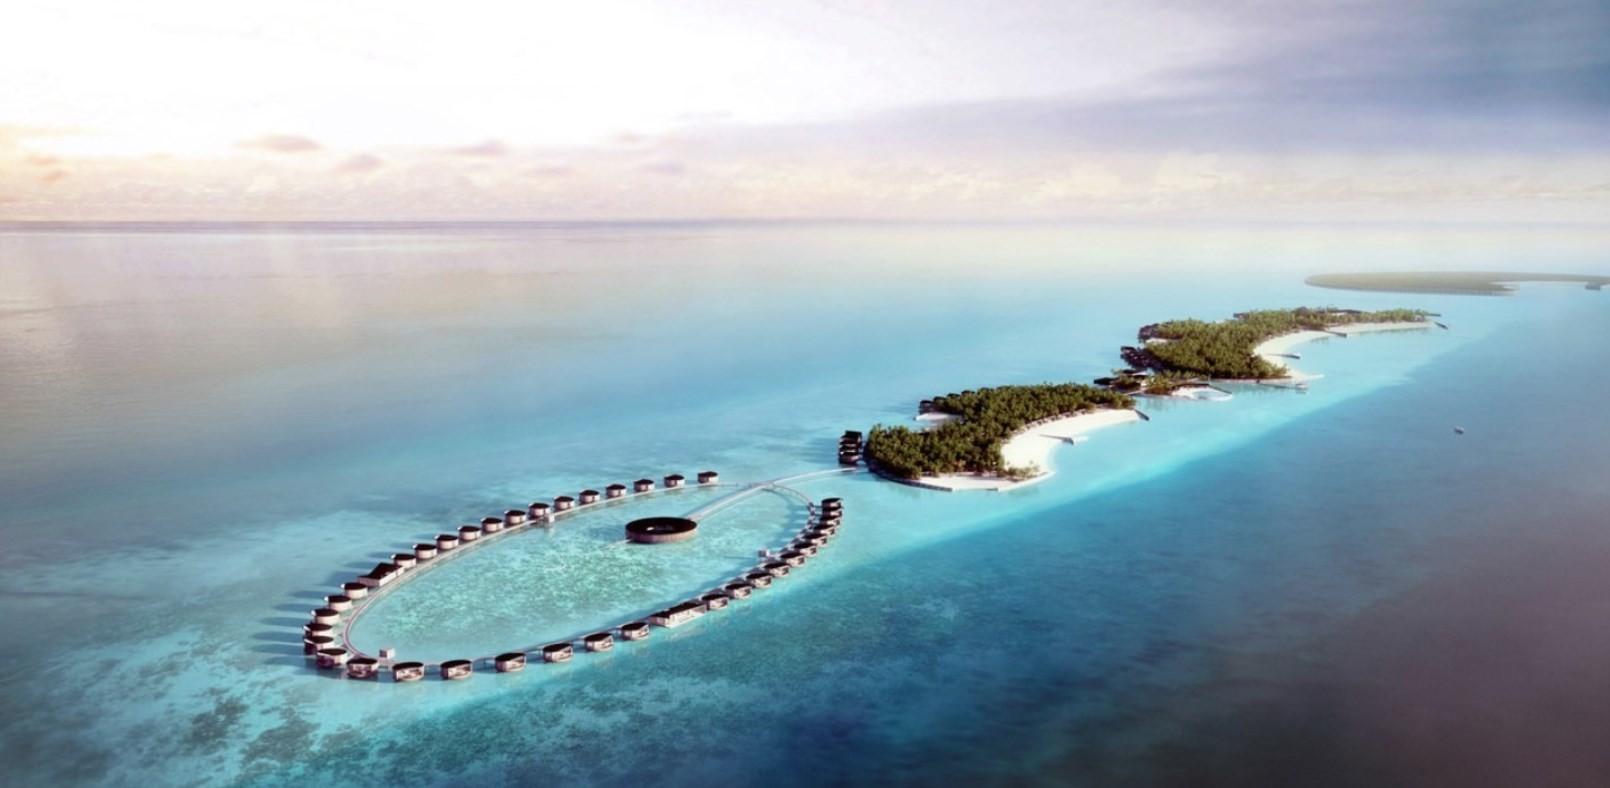 news-main-ritz-carlton-to-debut-in-maldives-late-2020.1589558120.jpg